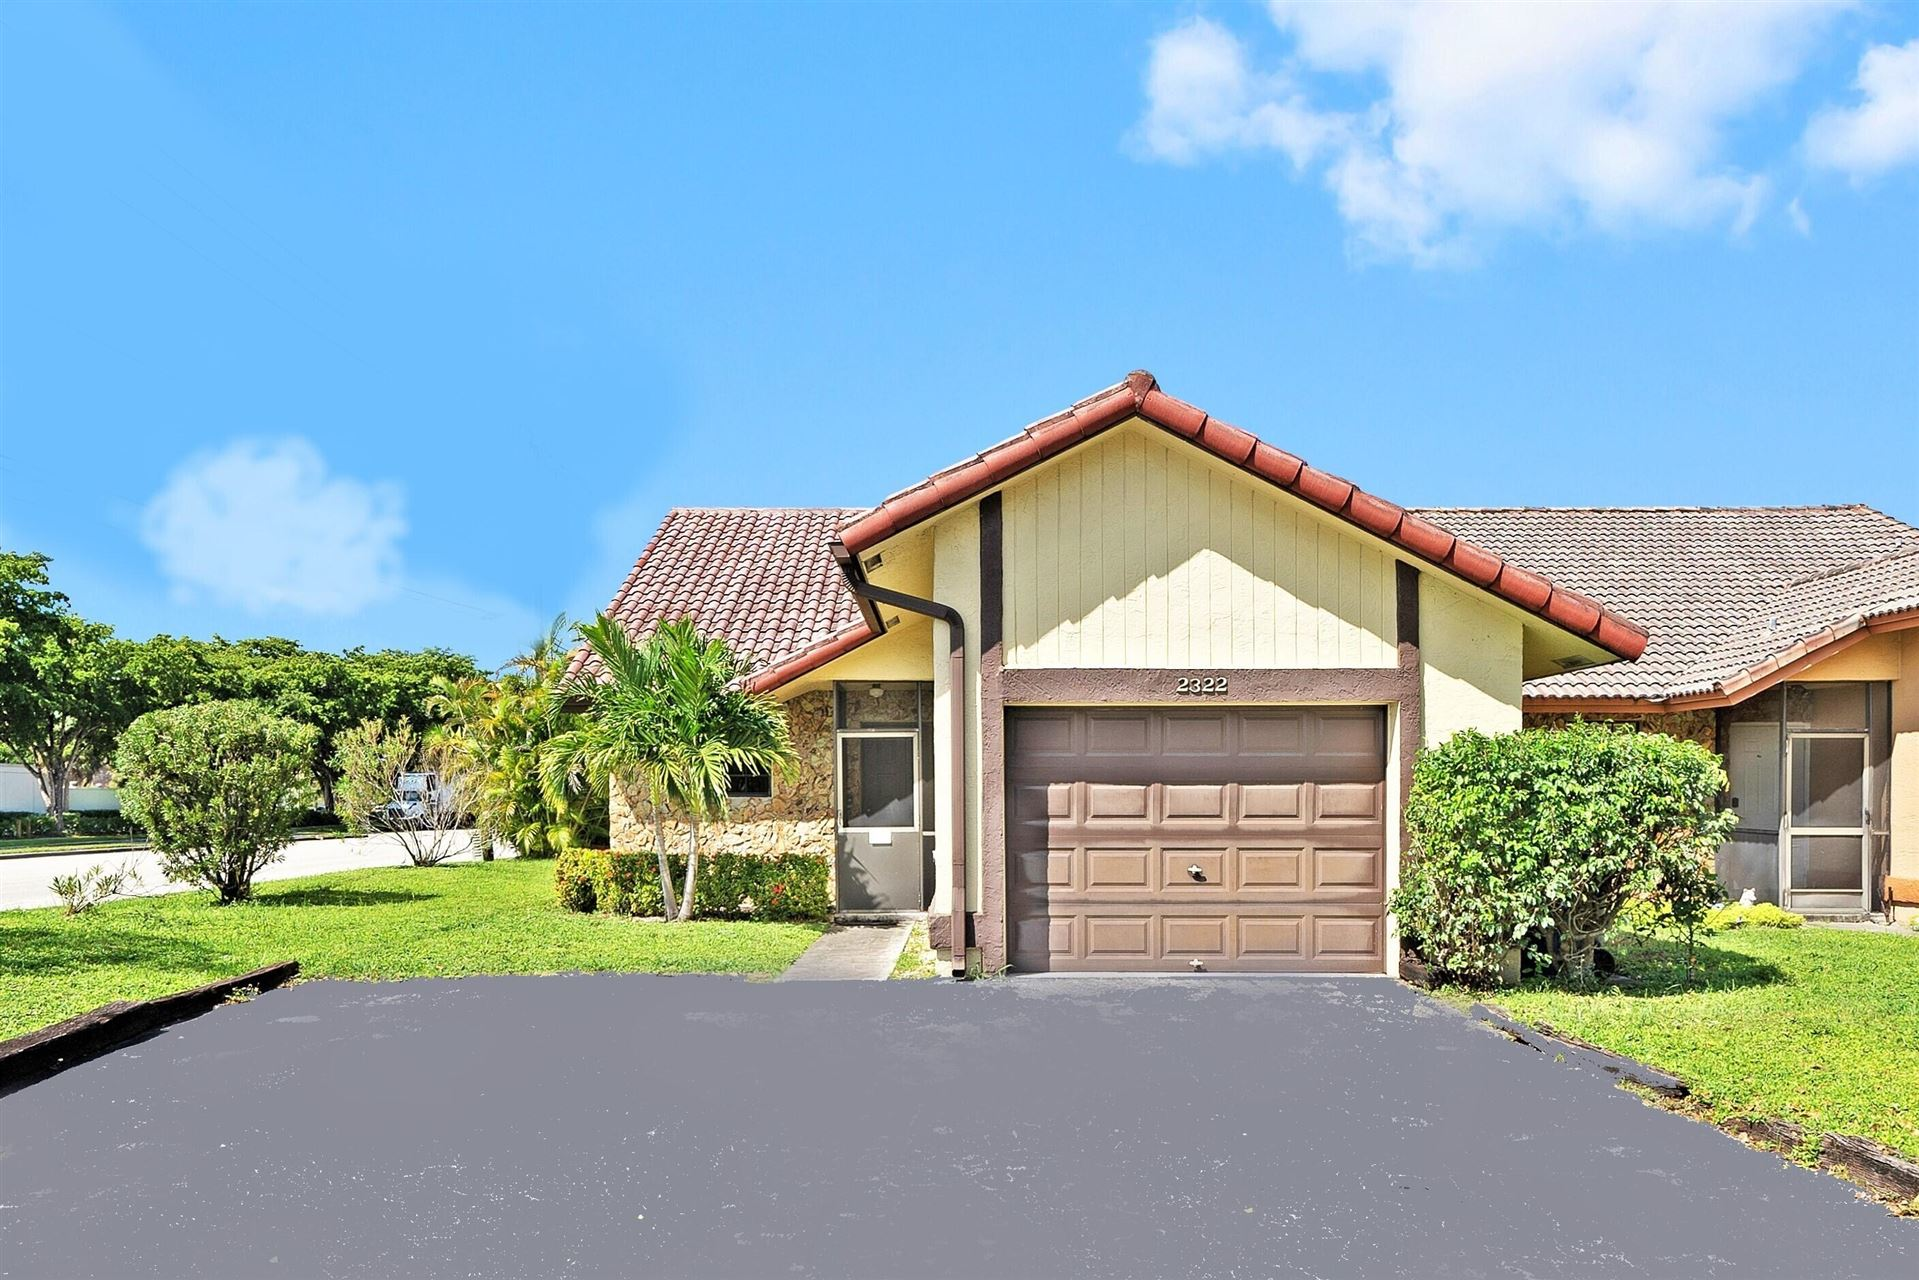 2322 NW 94th Avenue, Coral Springs, FL 33065 - MLS#: RX-10752034